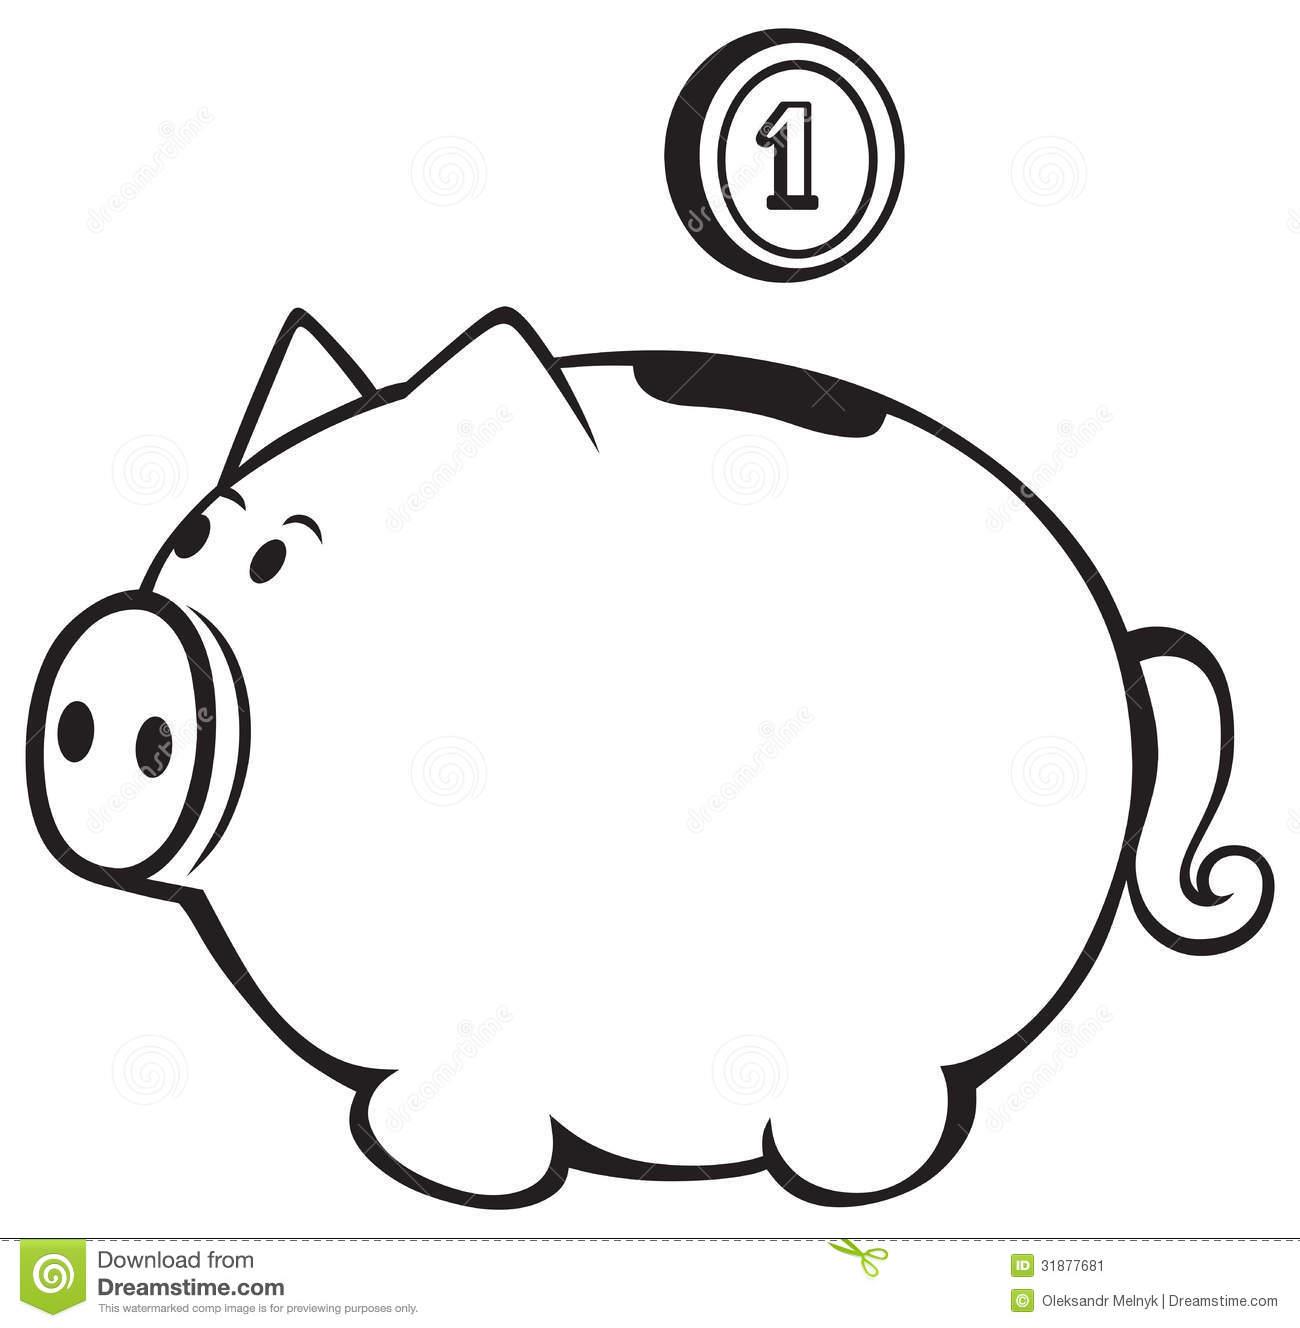 Piggy Bank Clipart Black And White-piggy bank clipart black and white-6